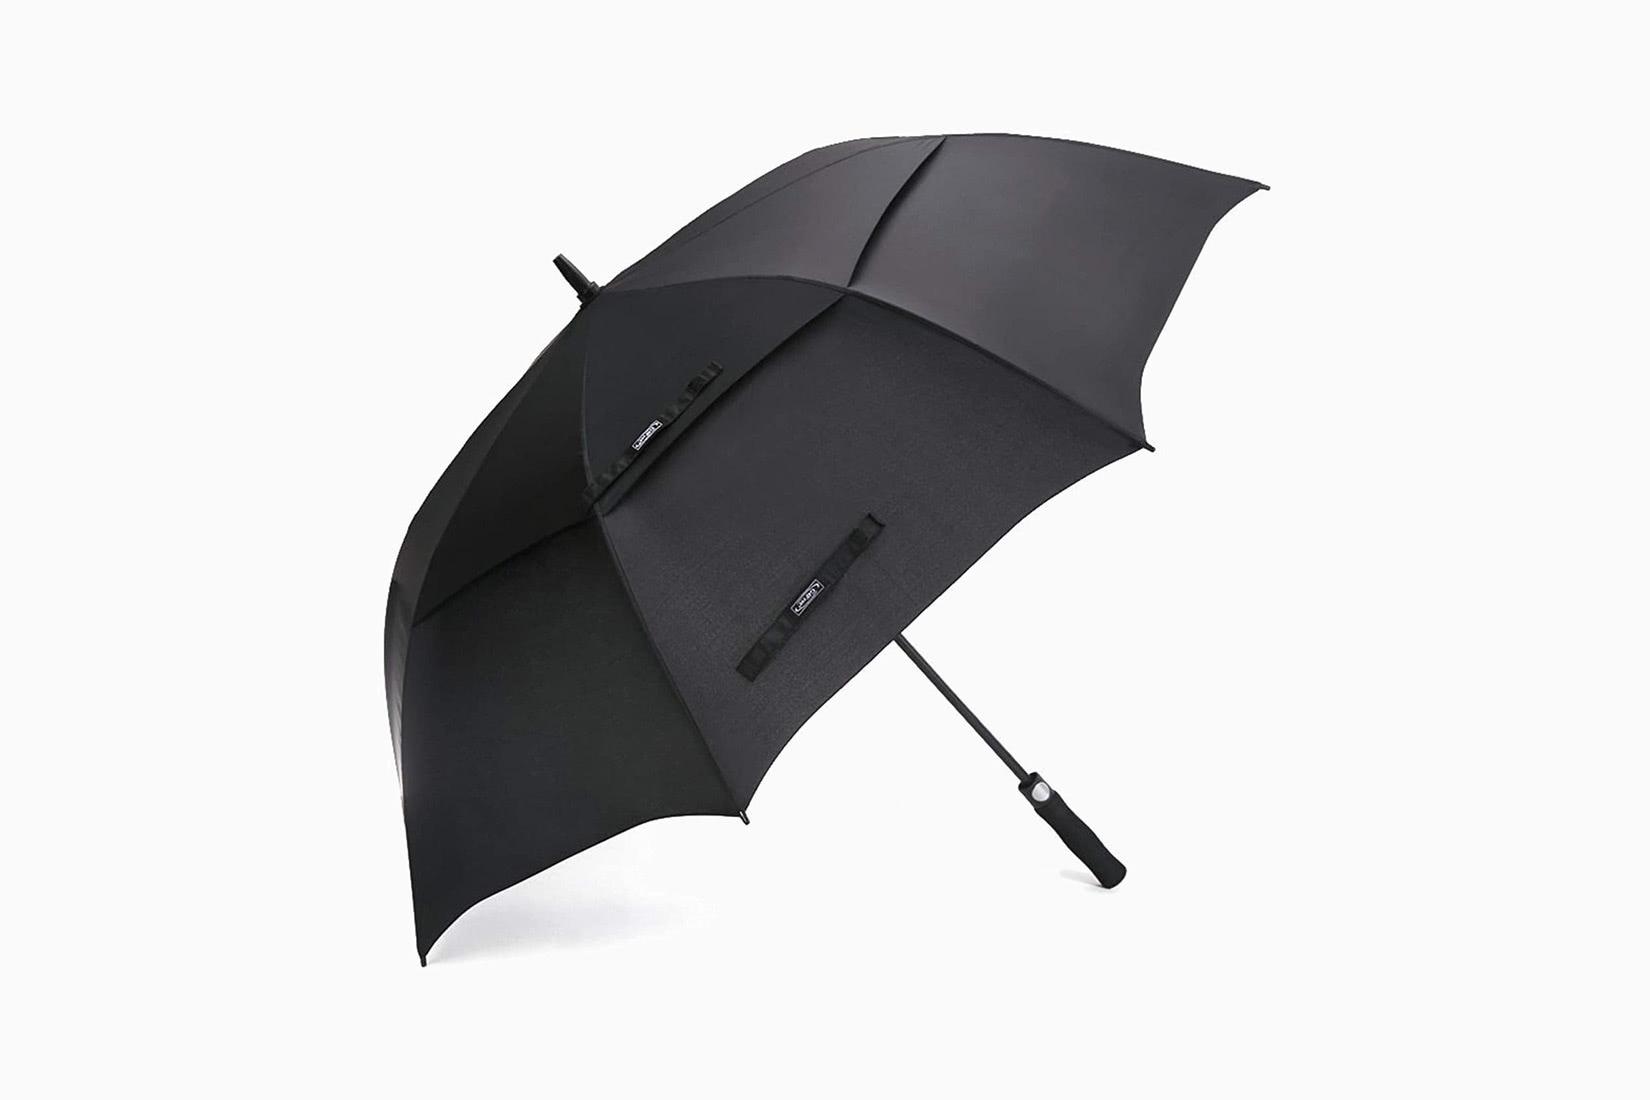 best umbrellas g4free golf umbrella luxe digital